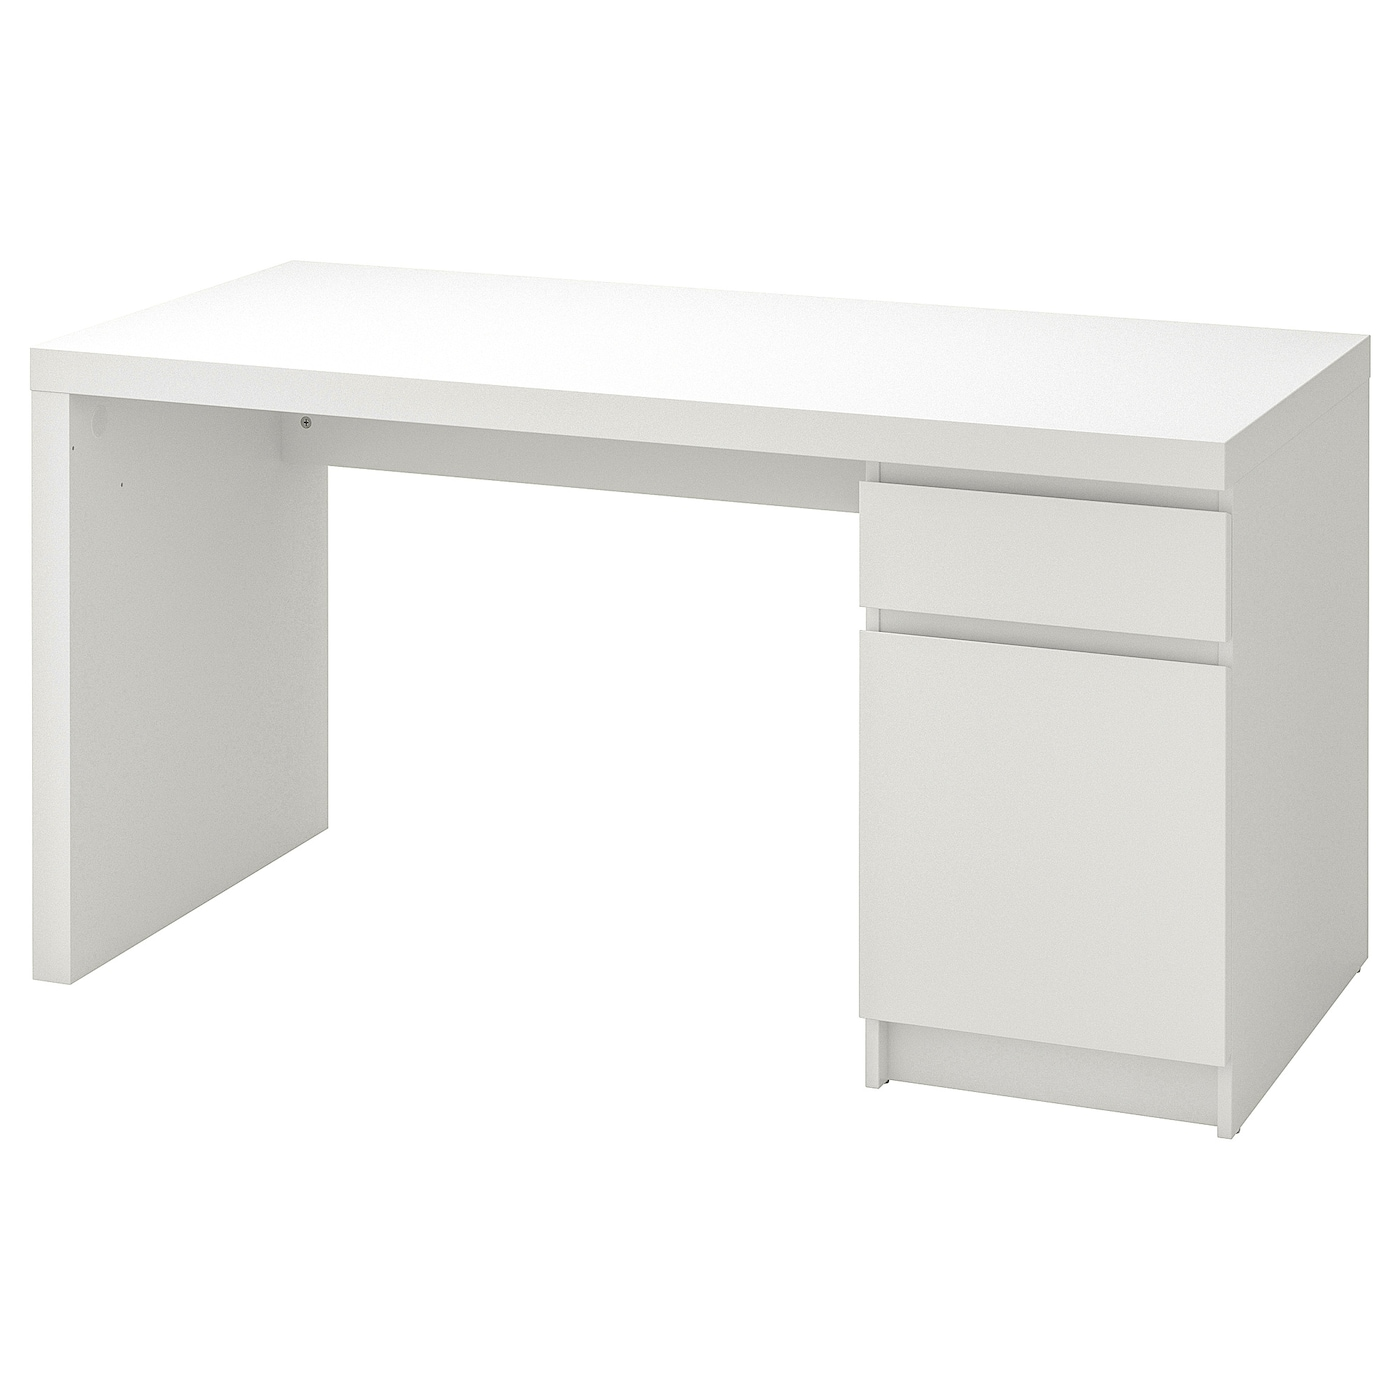 Malm Desk White 55 1 8x25 5 8 Ikea